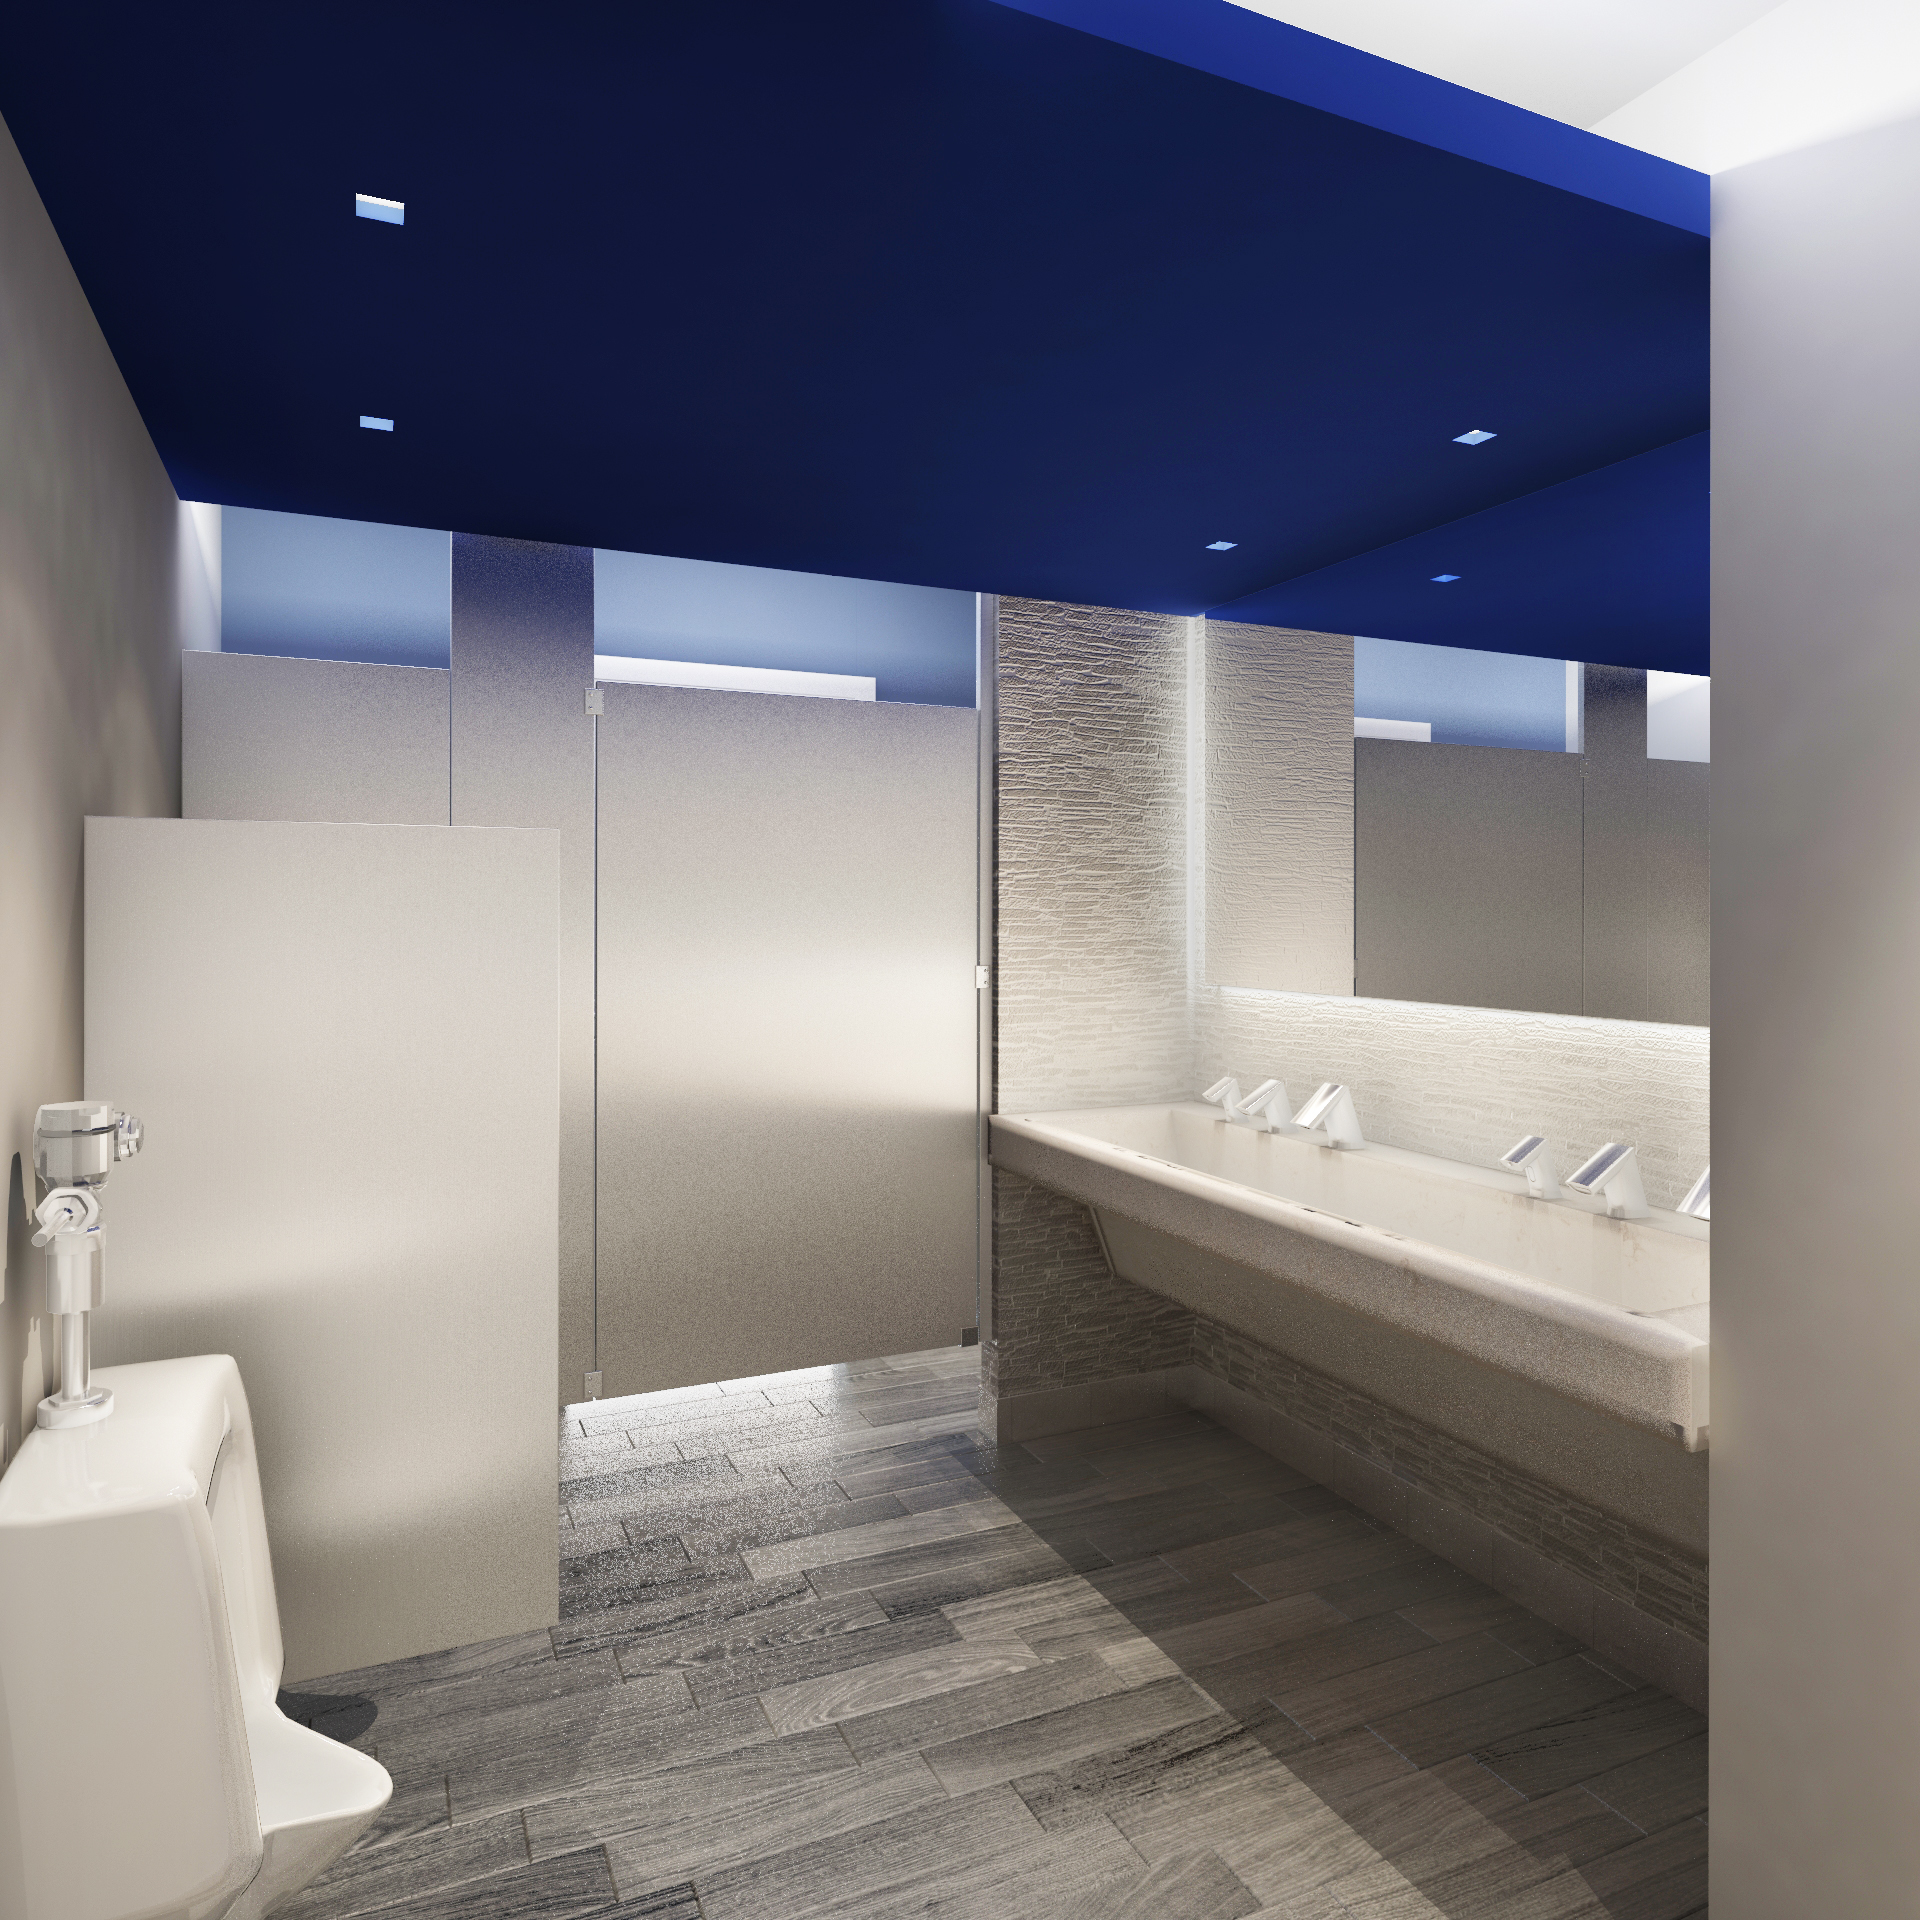 OTJ_16_11_1501_Tenant_Bathroom_Final.jpg